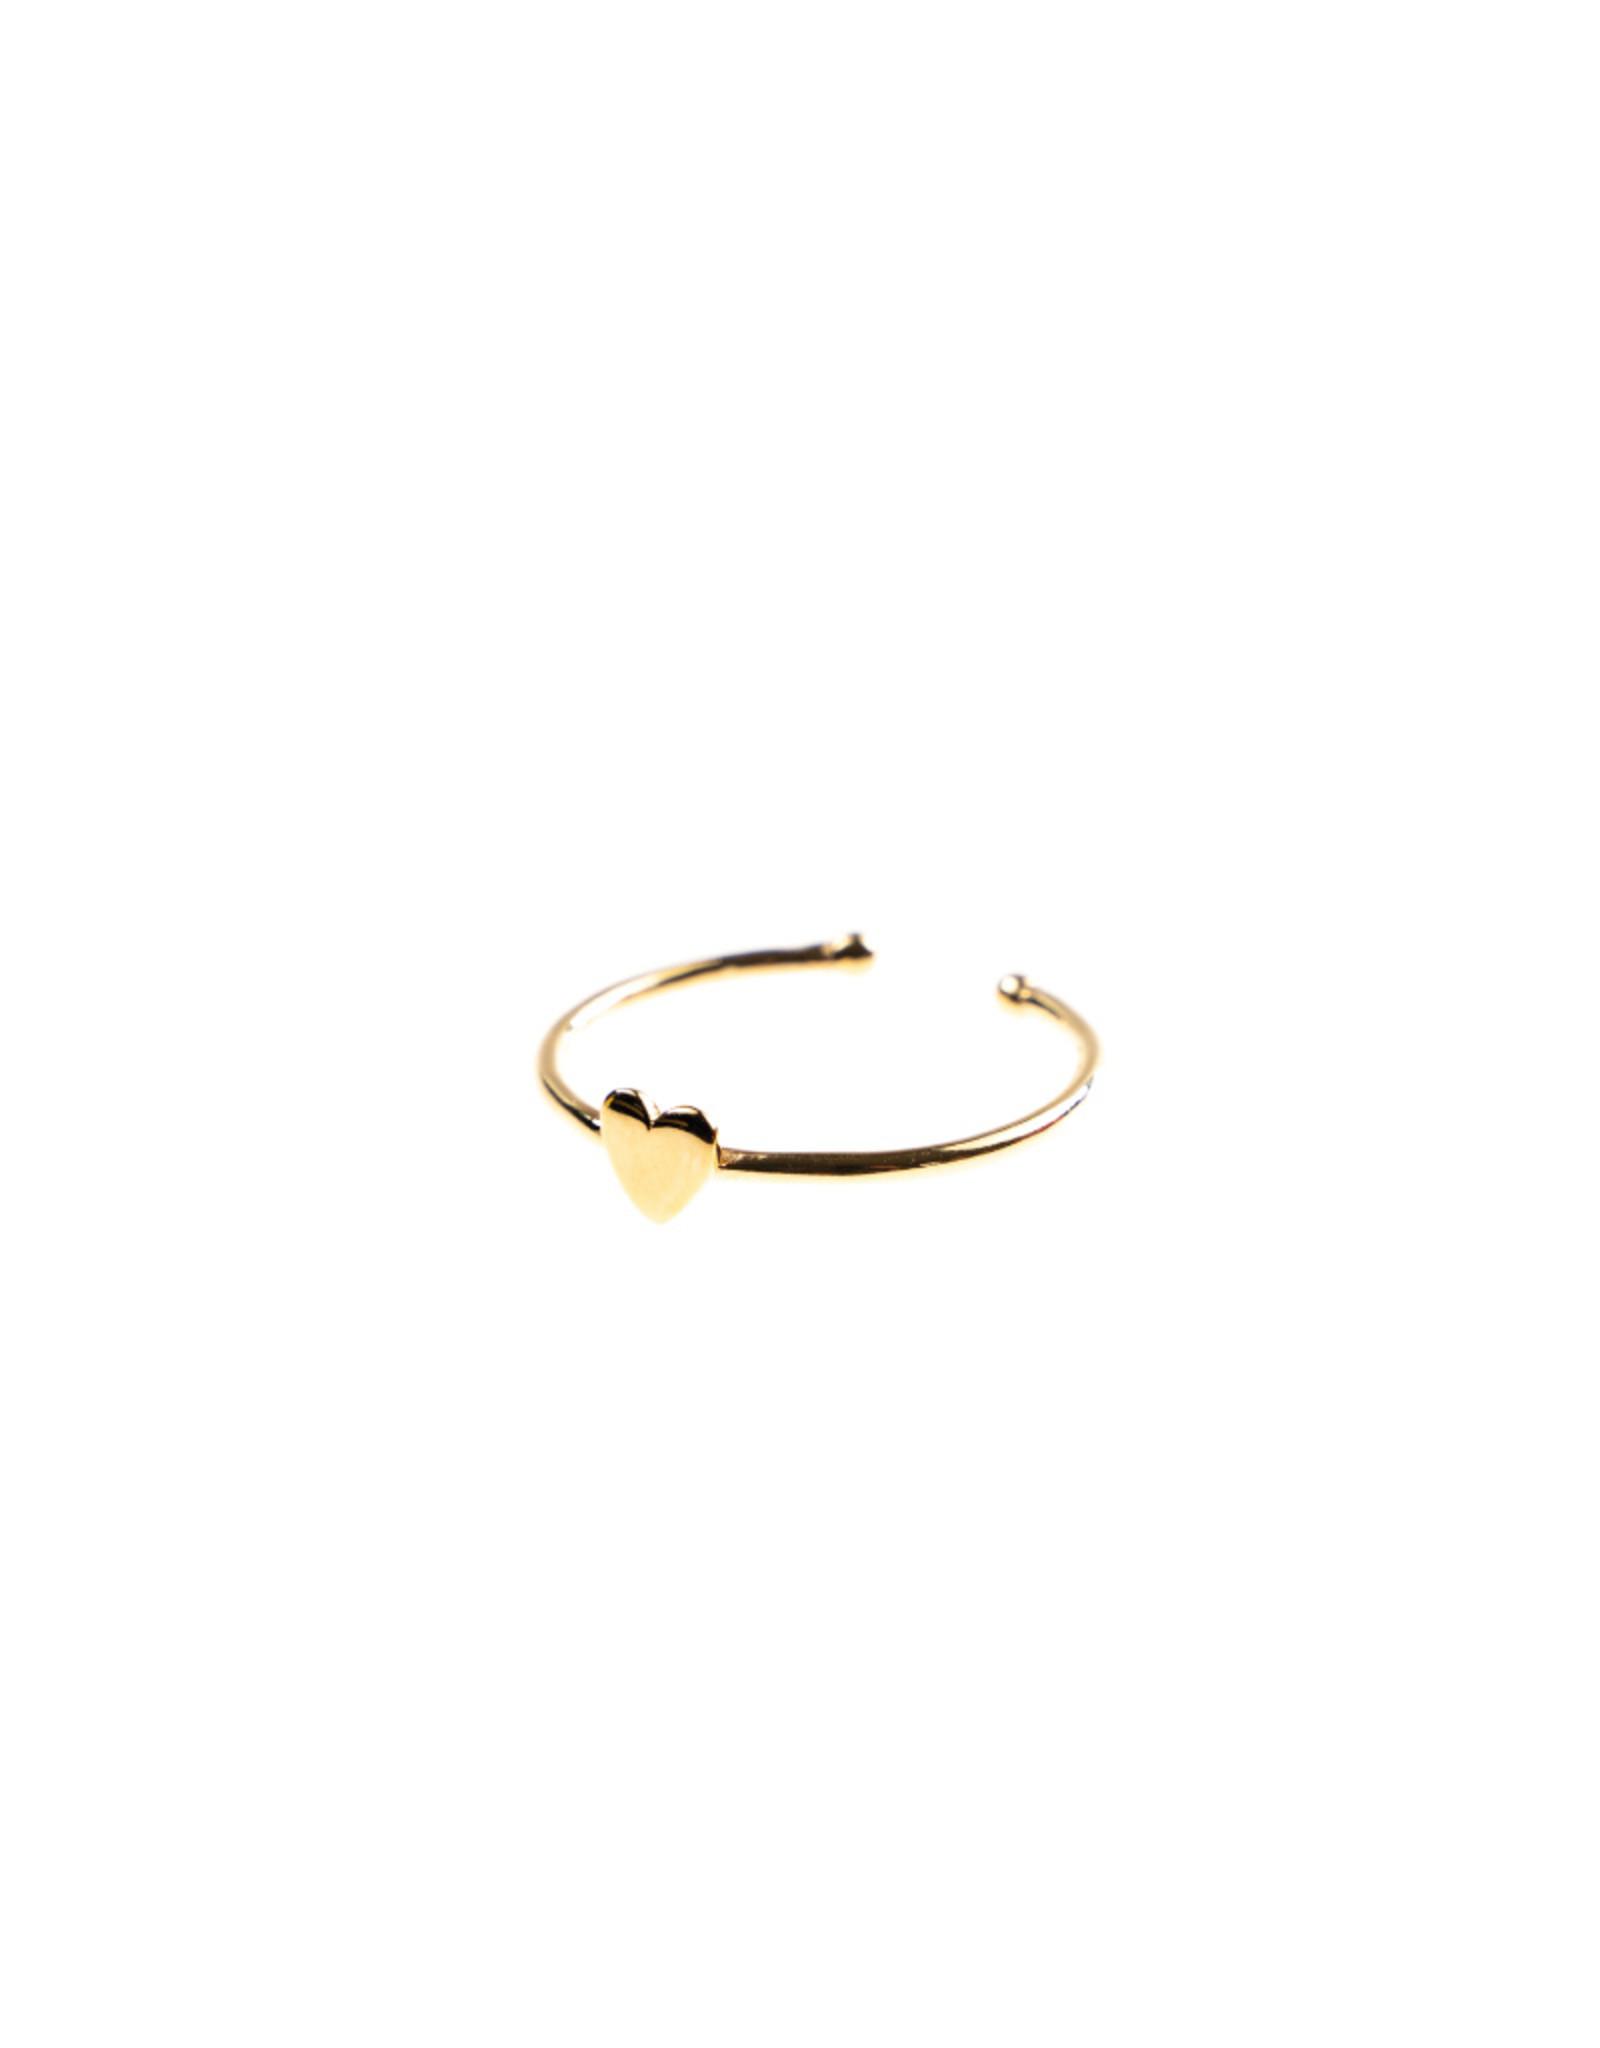 Selva Sauvage ring 14mm